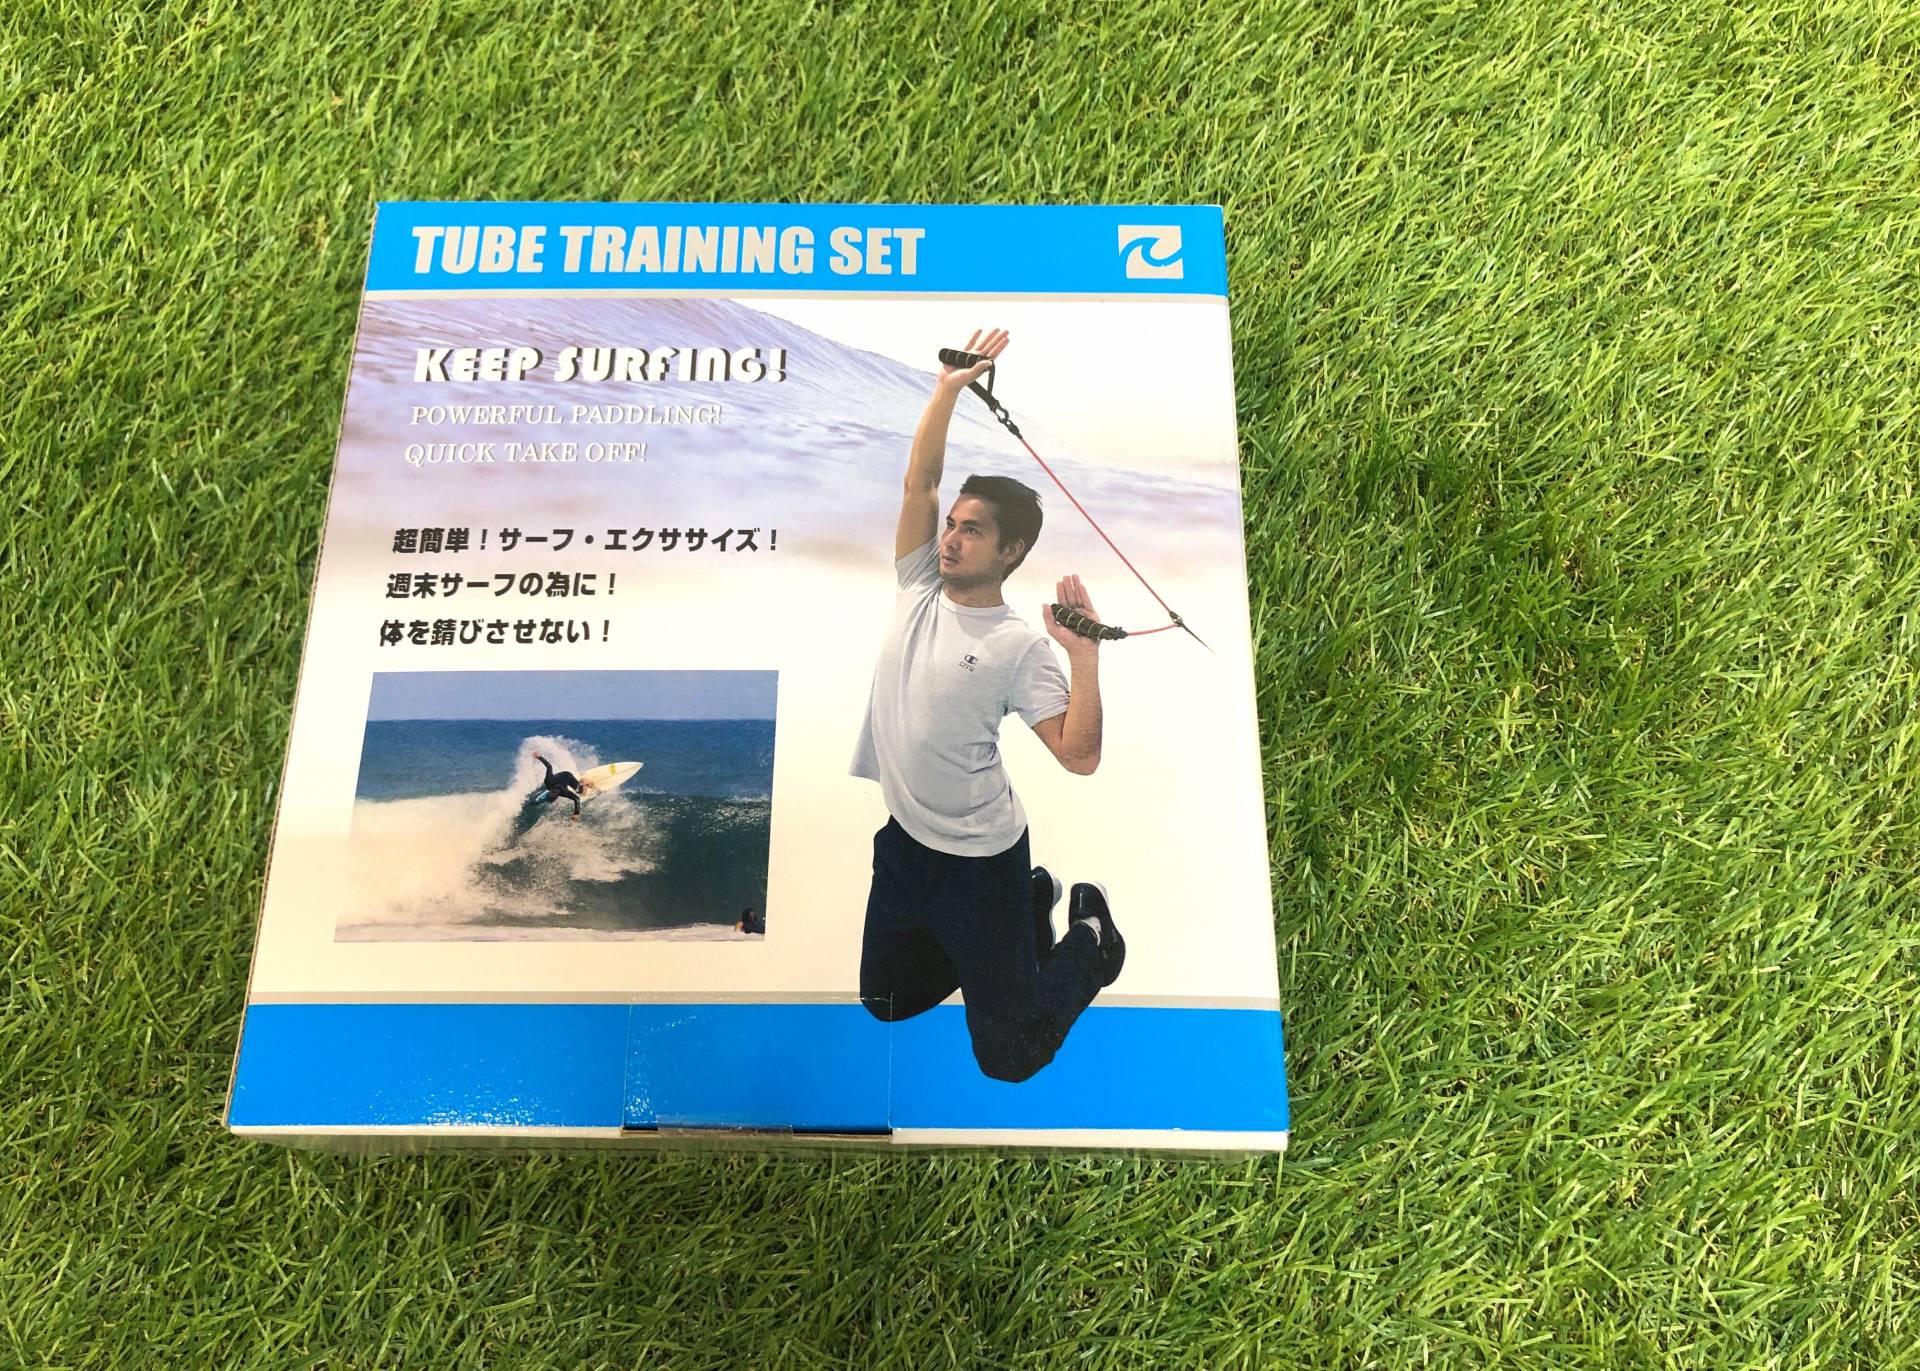 【EXTRA】自宅でパドリング強化ができる!オススメせずにはいられない、サーファー&スイマーの為のトレーニングチューブセットが入荷!